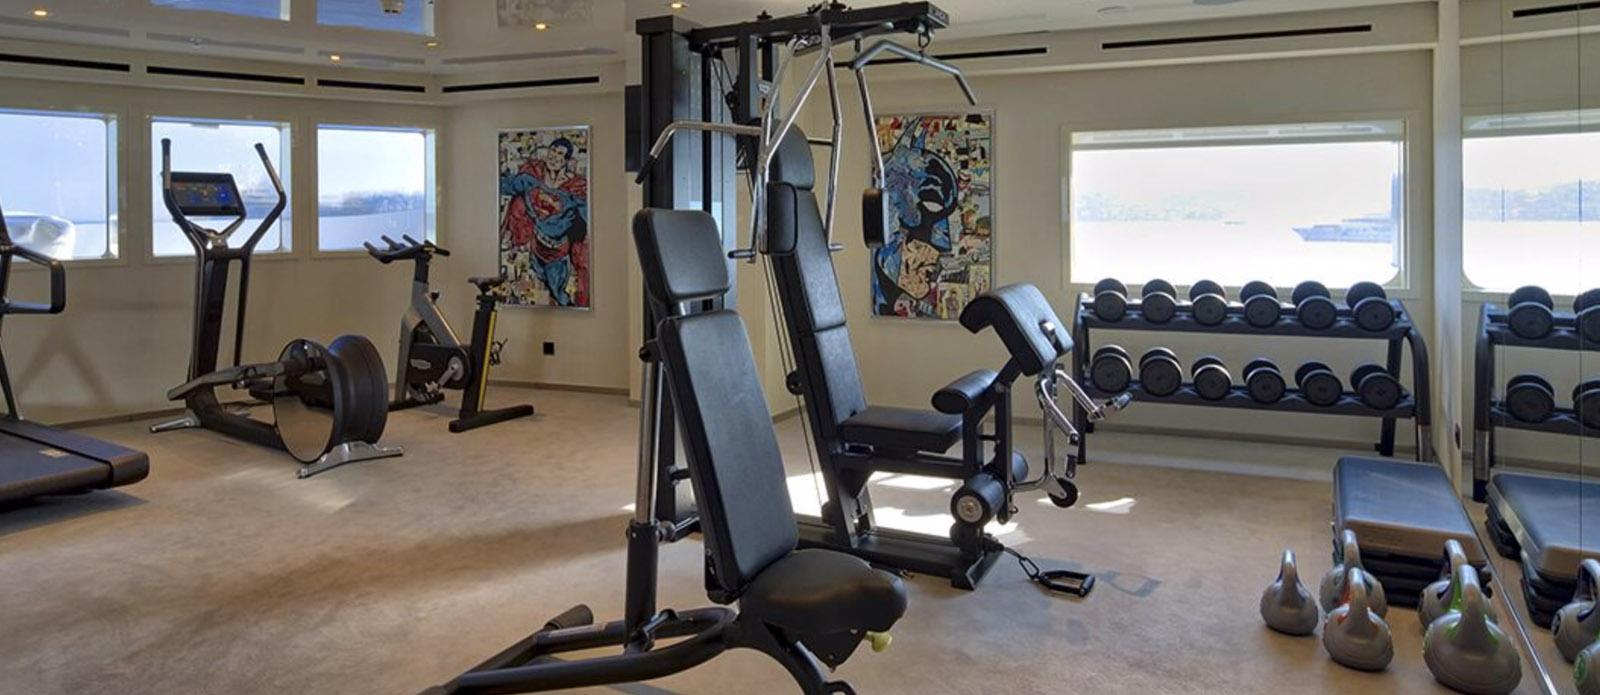 Serenity - Gym